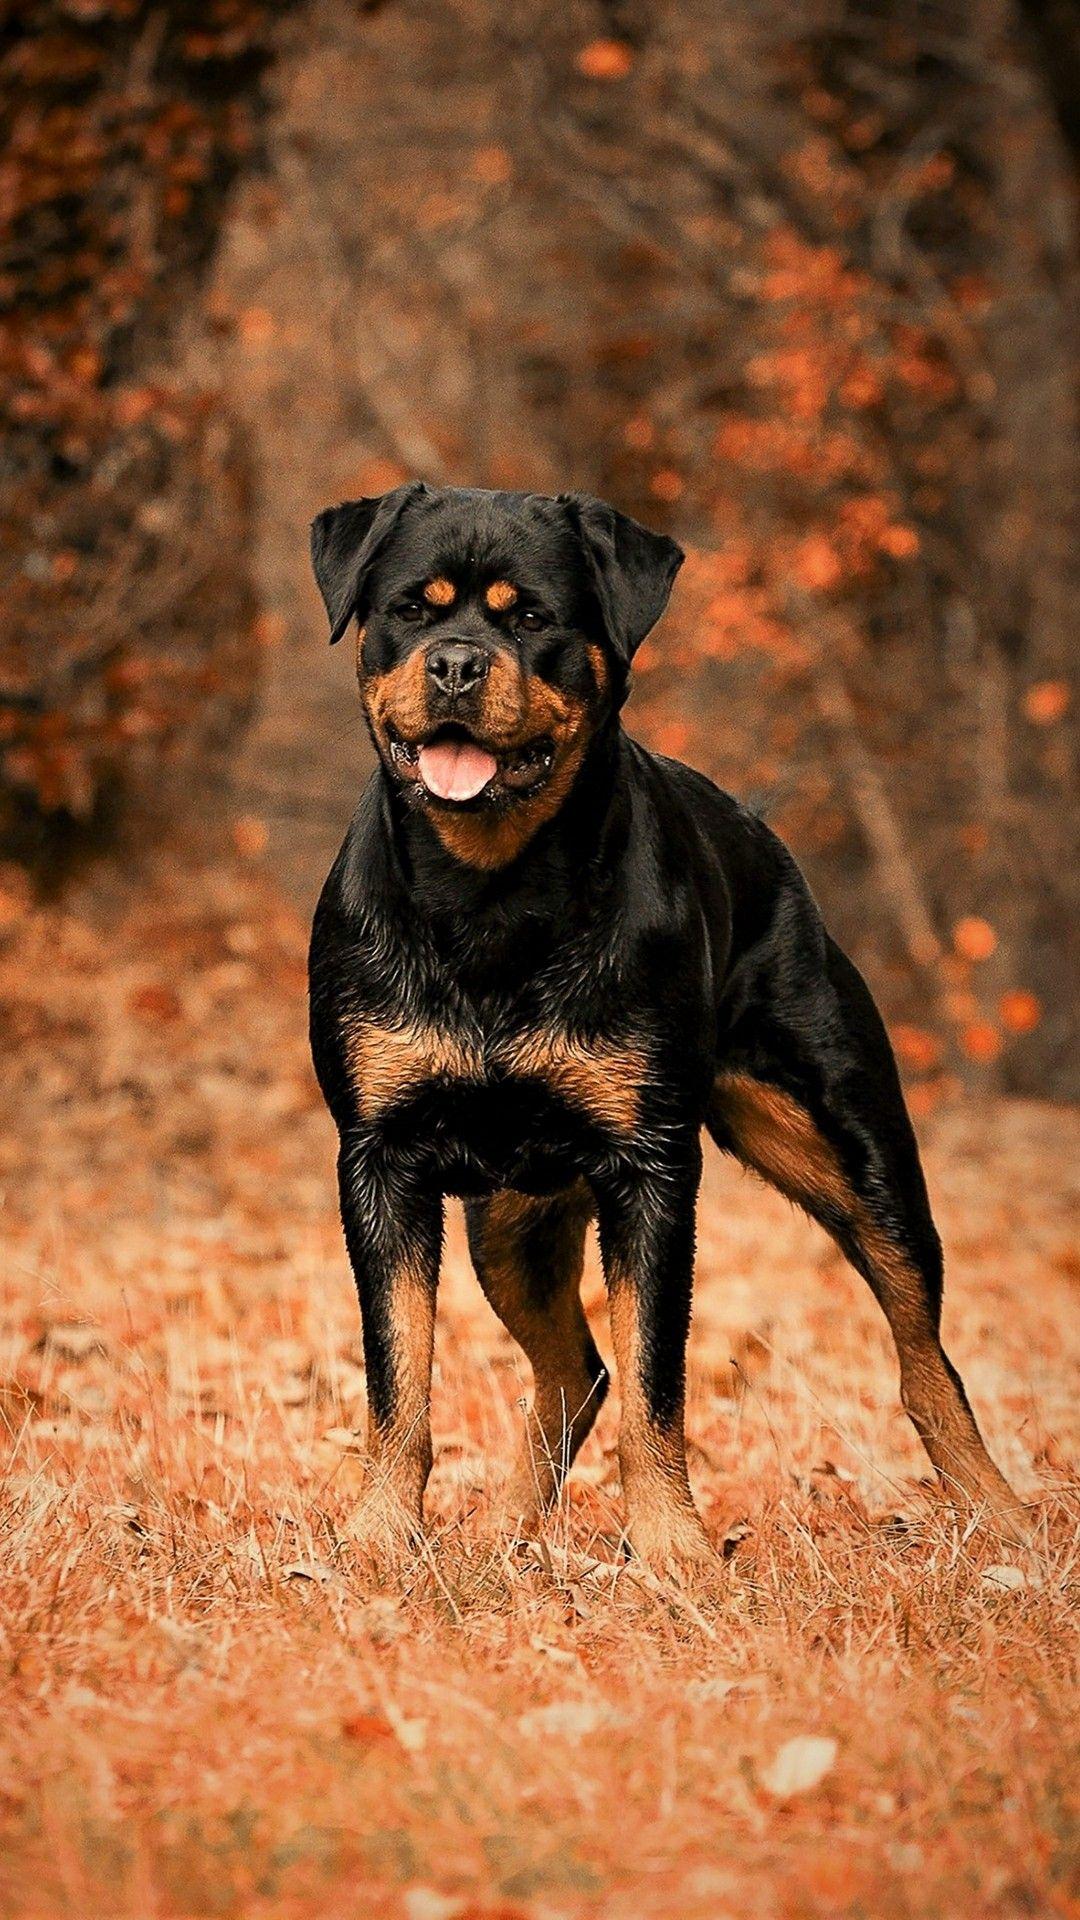 [+] Black Rottweiler Dog